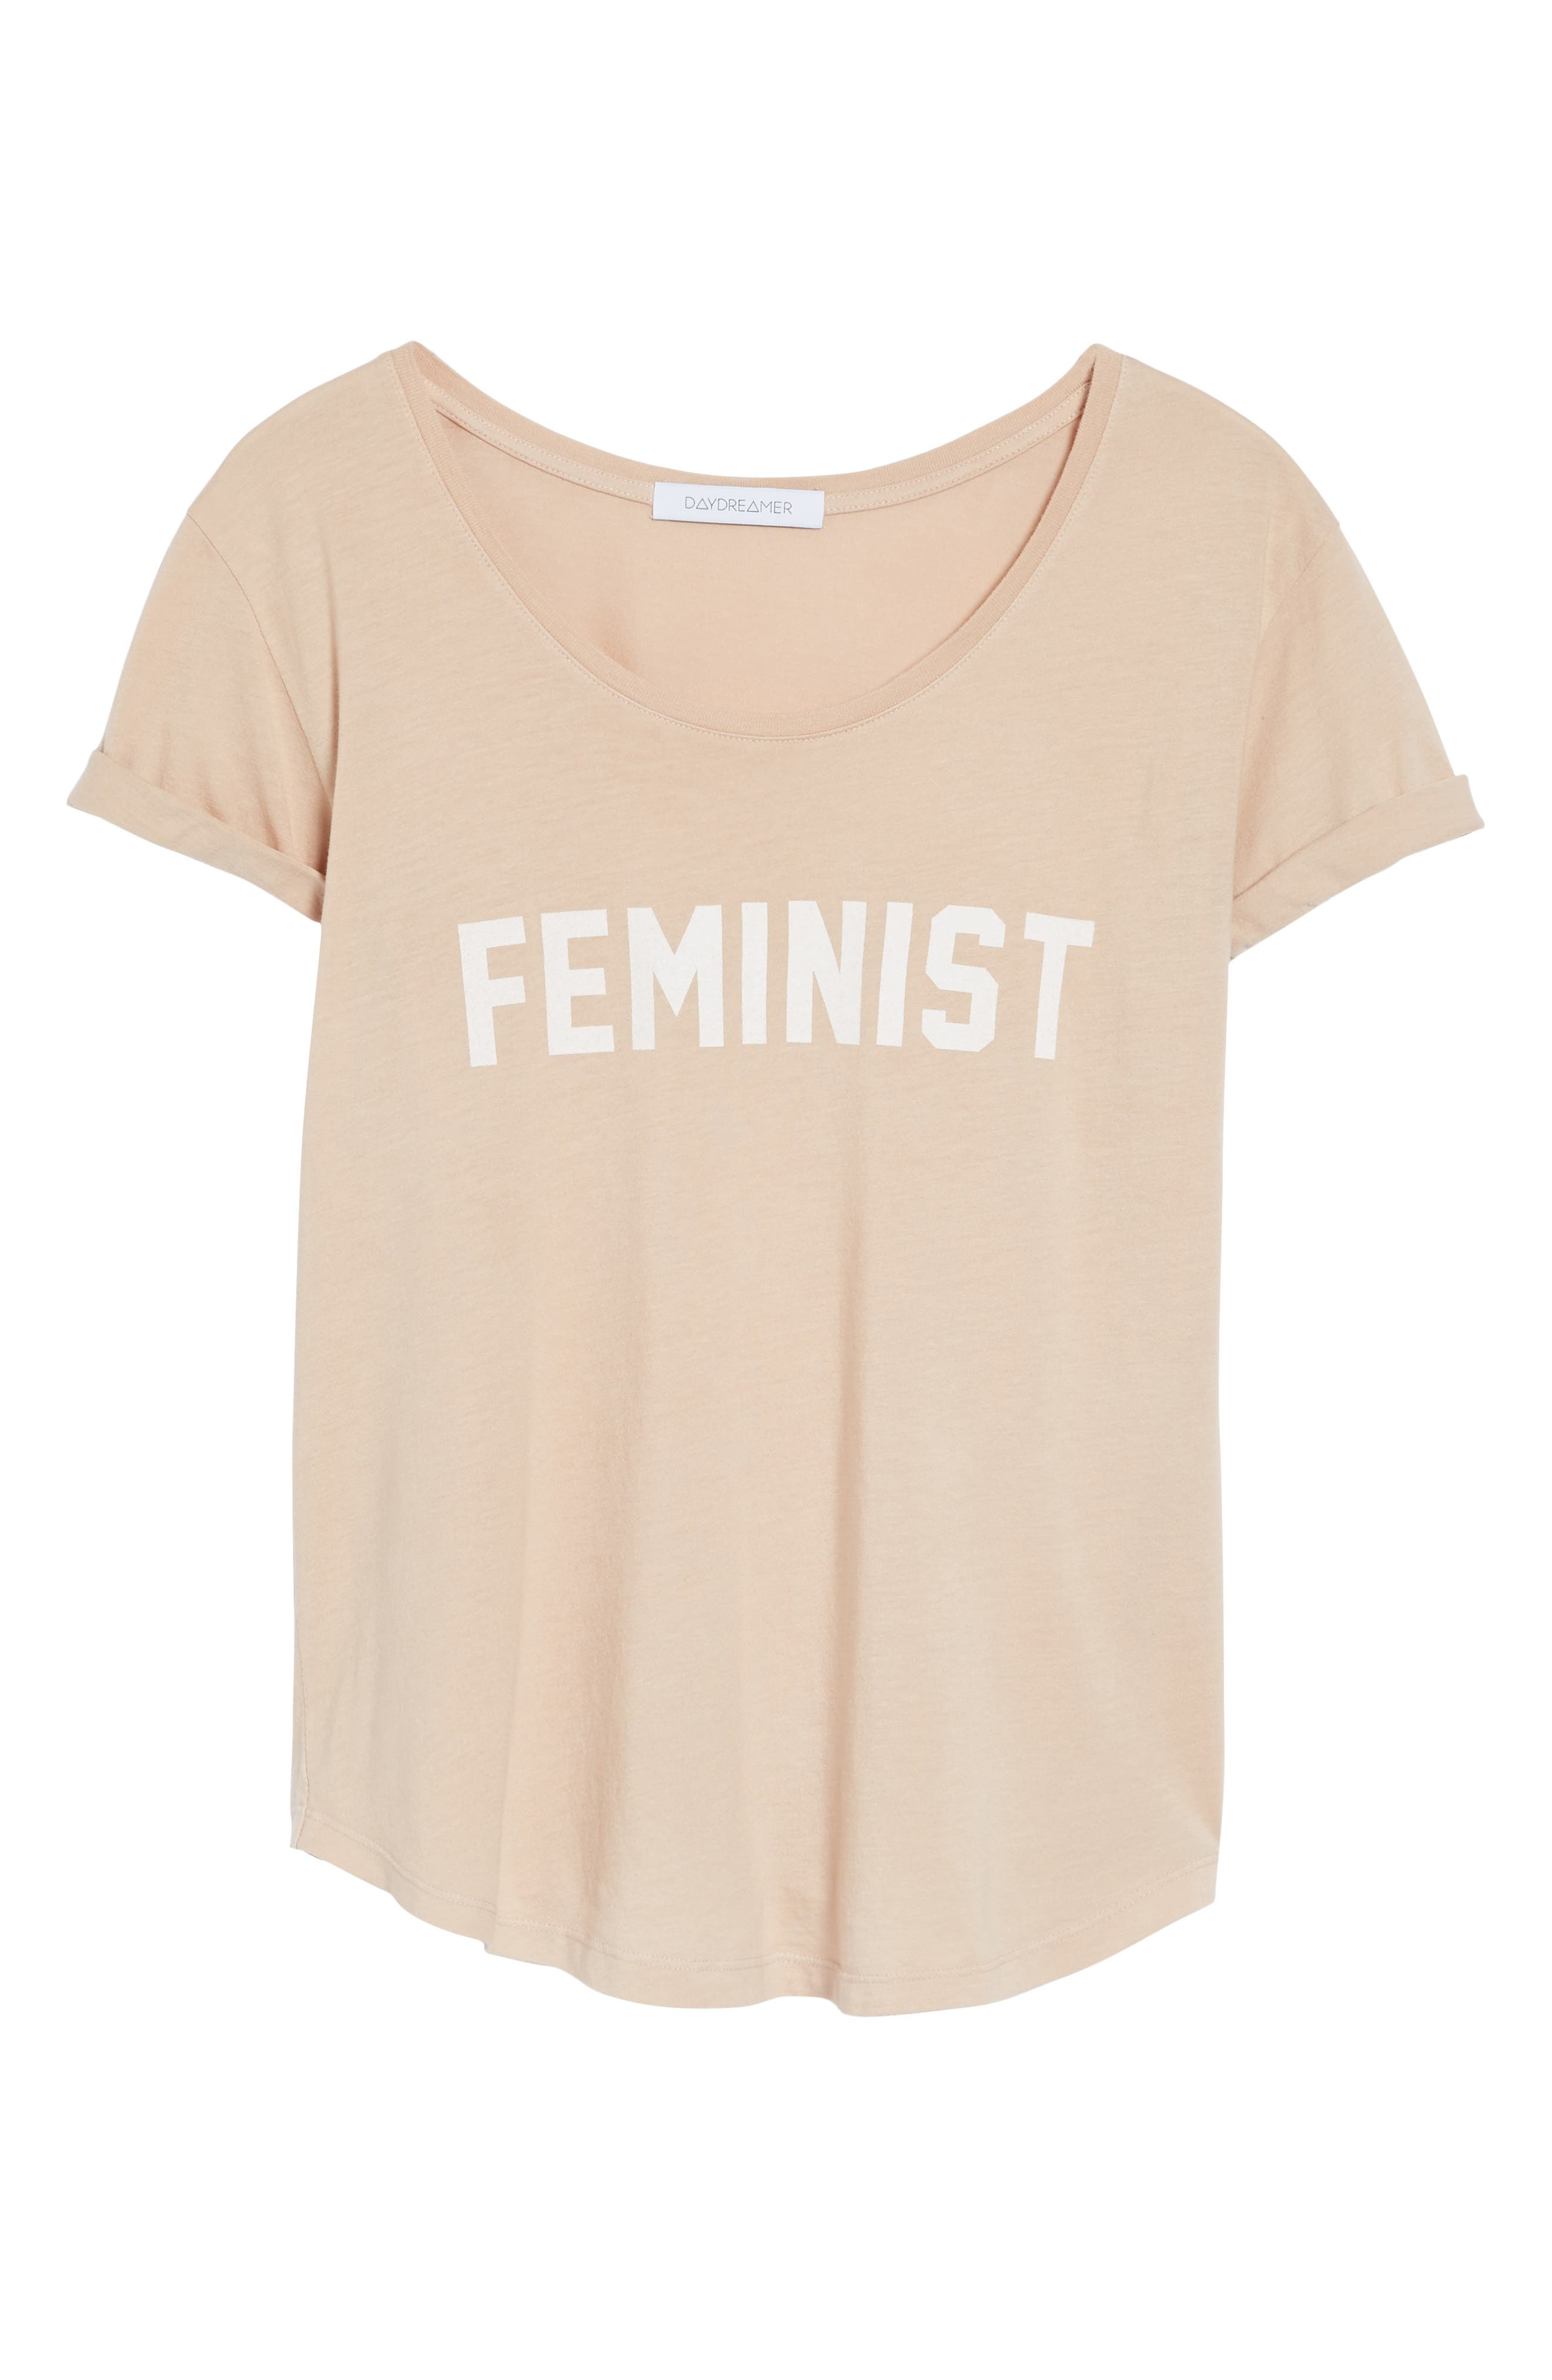 Feminist Graphic Tee,                             Alternate thumbnail 6, color,                             250